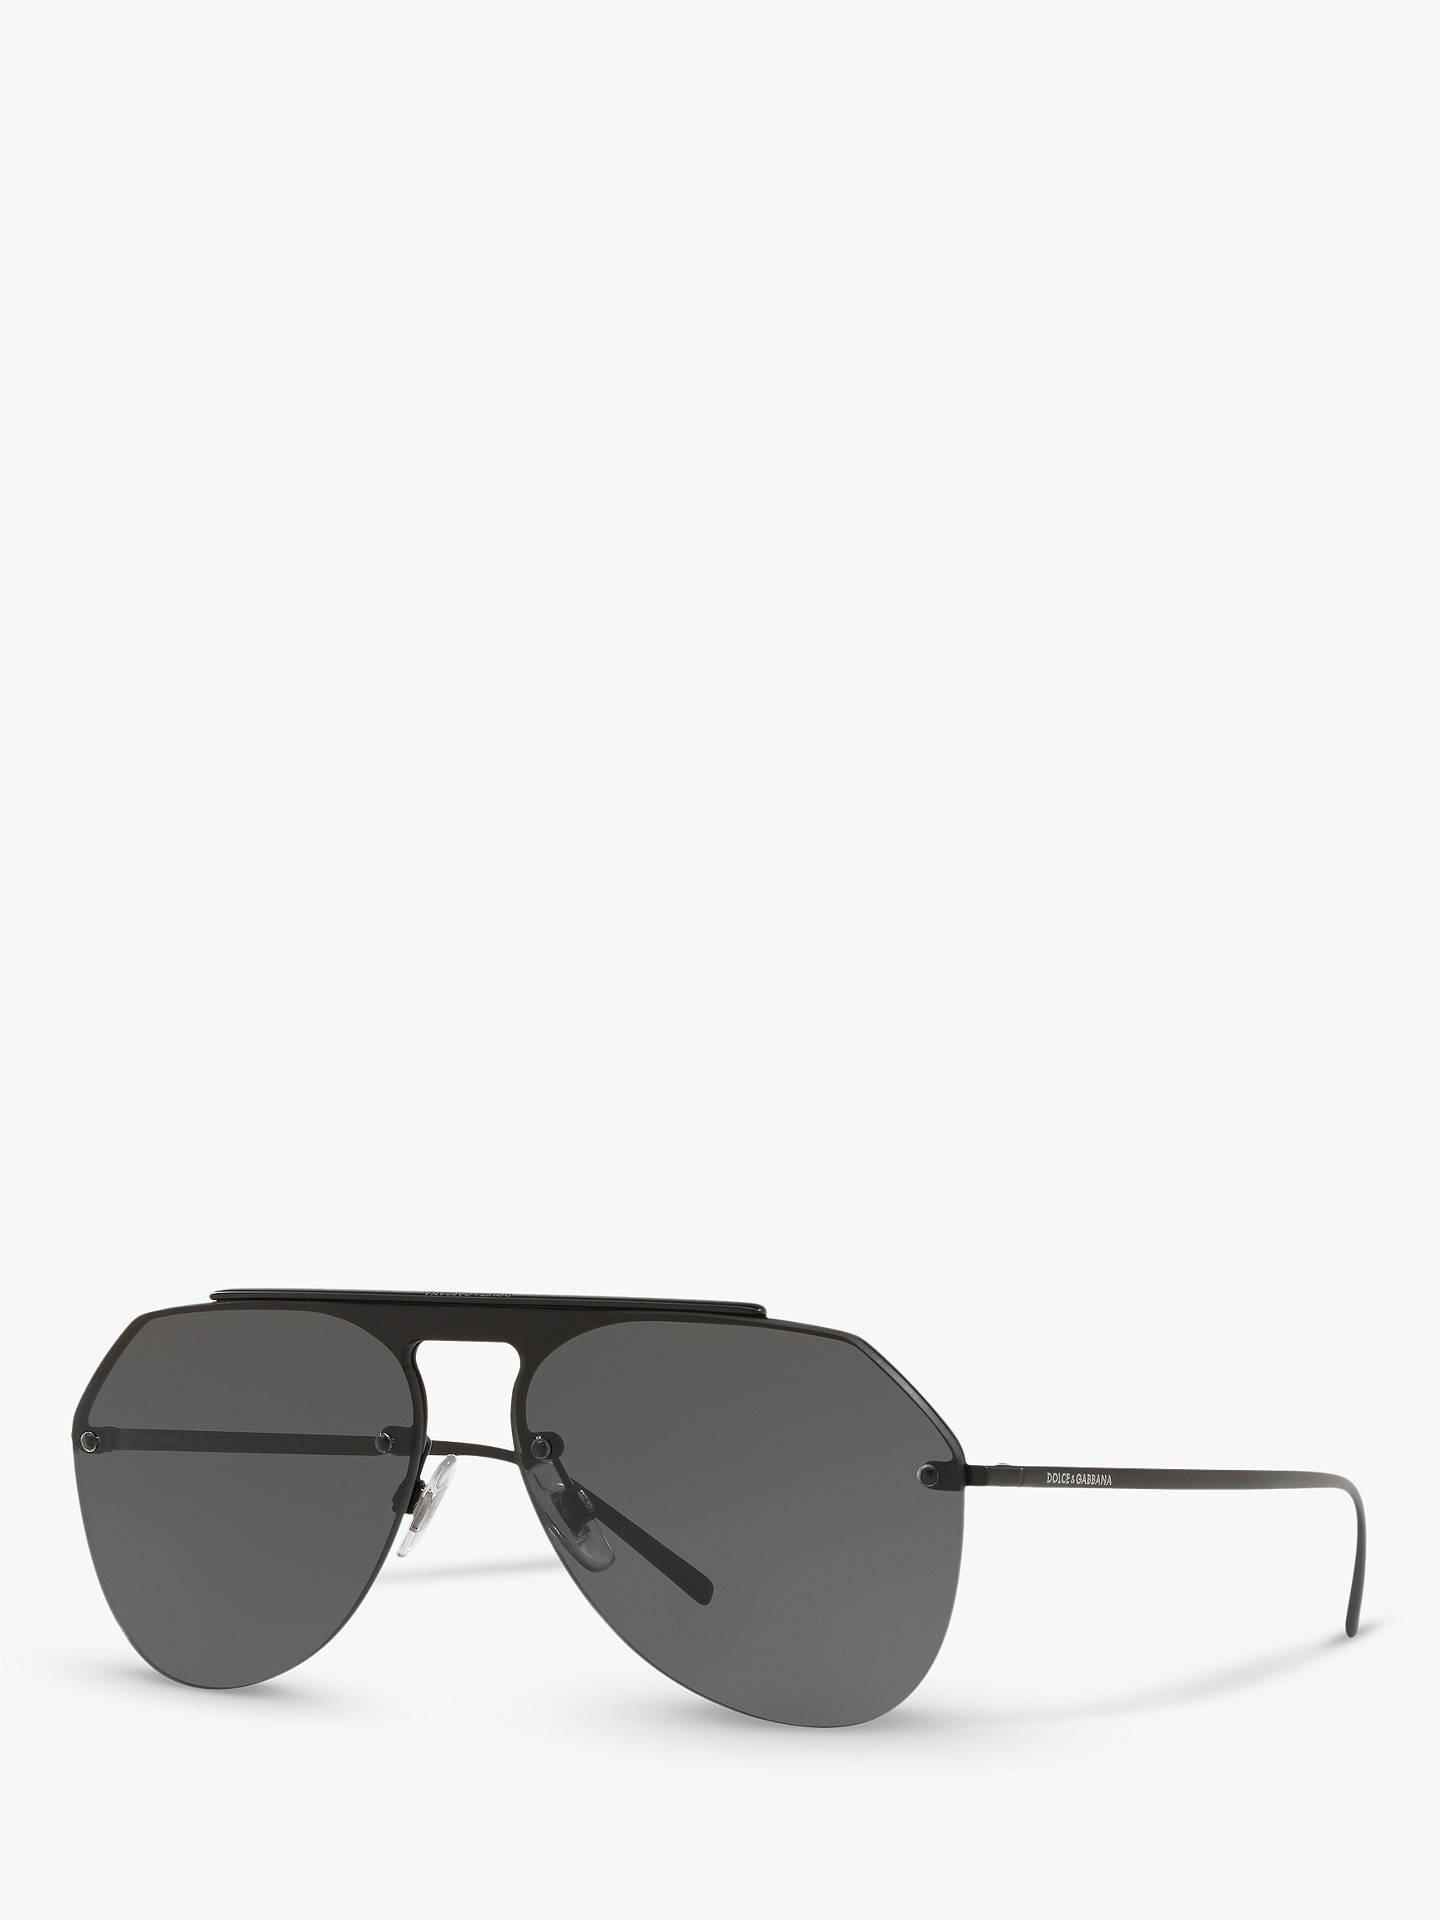 ad63457eb6cb7 Dolce   Gabbana DG2213 Men s Aviator Sunglasses at John Lewis   Partners